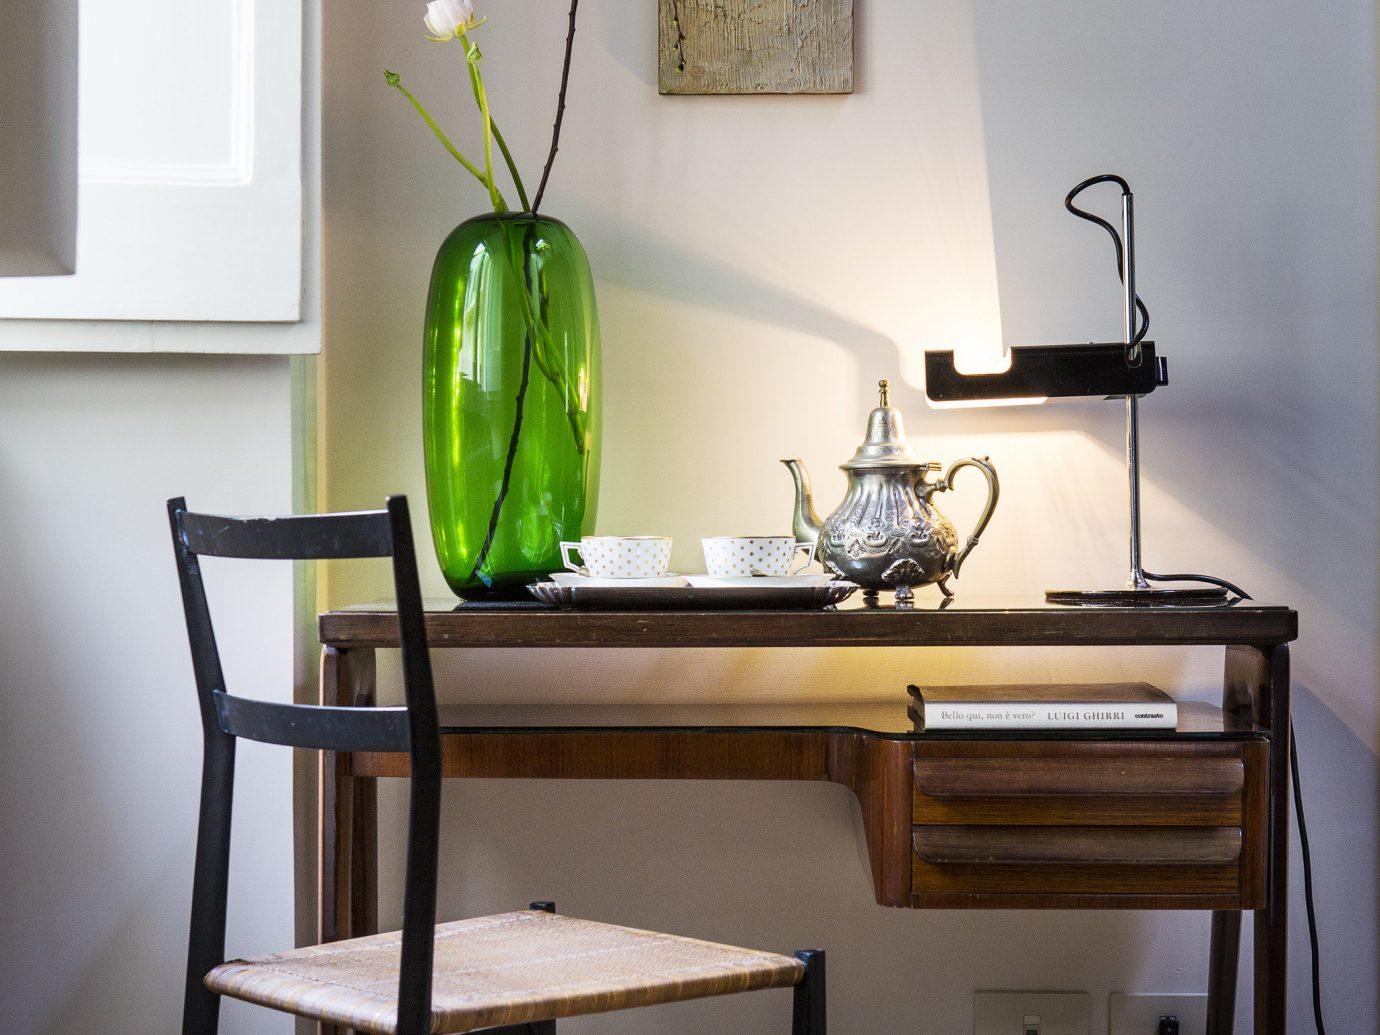 Hotels wall floor indoor furniture dining room room table desk living room interior design wood home lamp